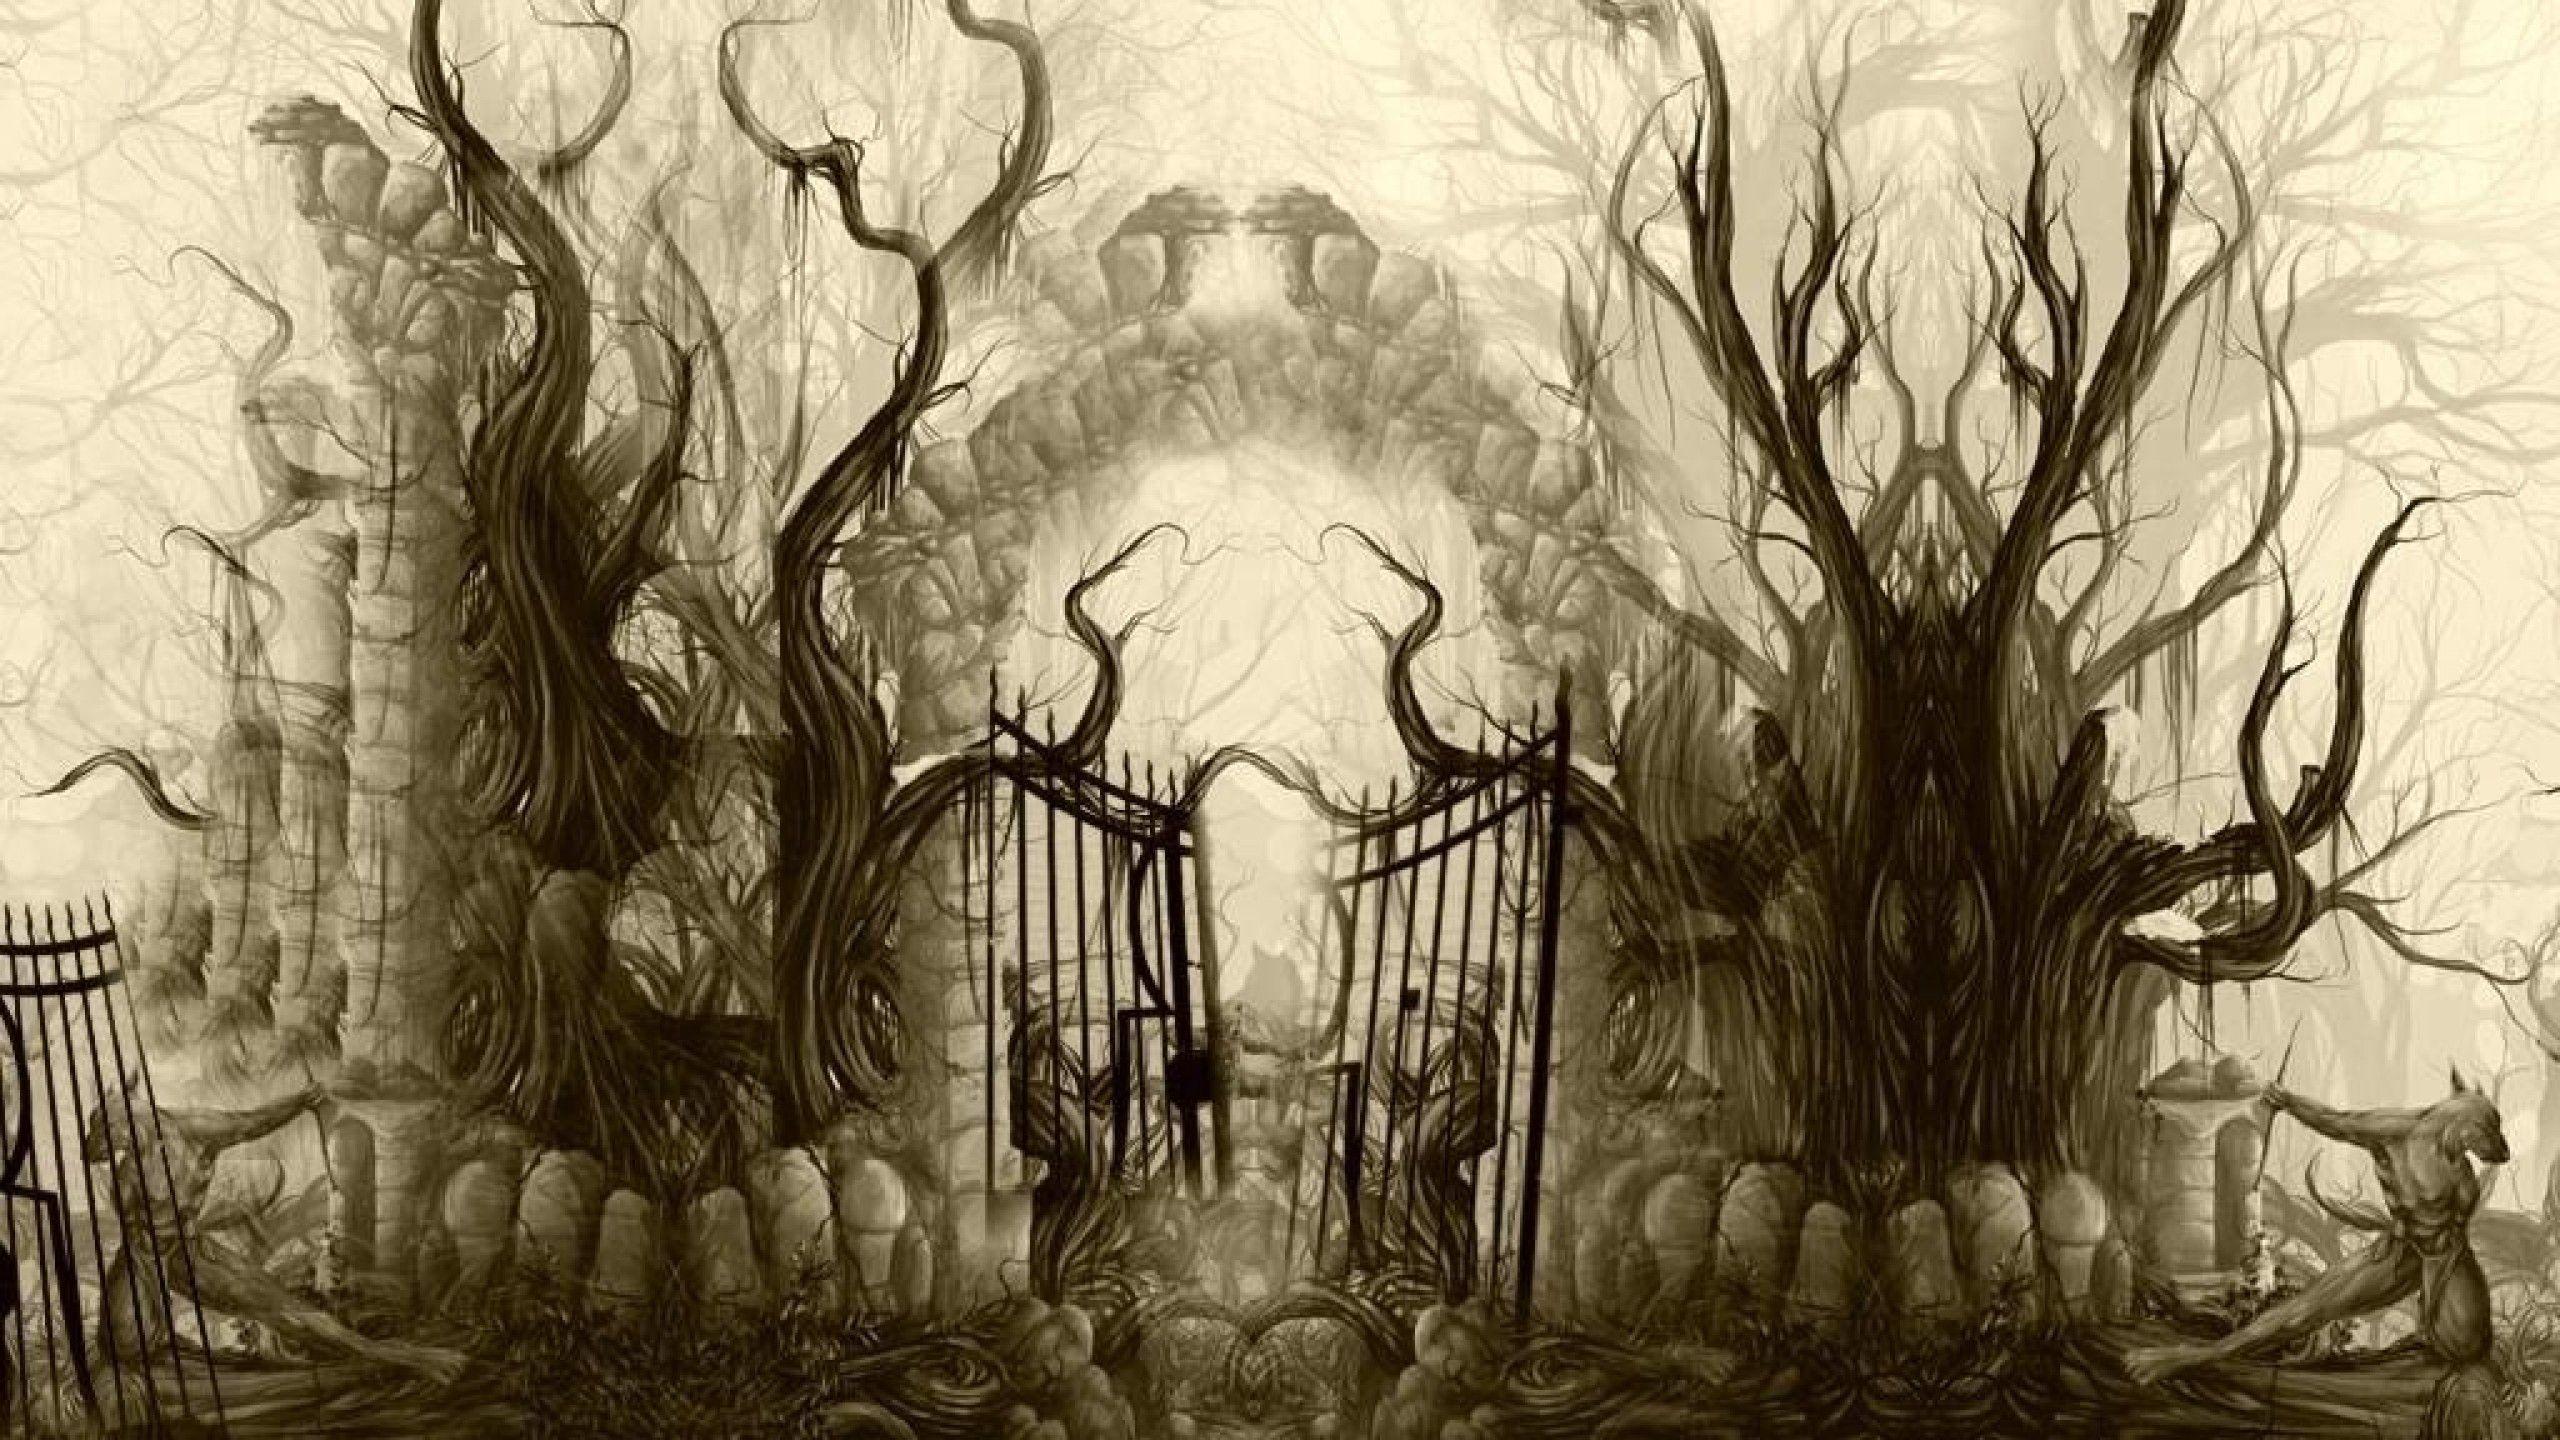 Cemetery Gates by richardro.deviantart.com on @DeviantArt ... | 2560 x 1440 jpeg 571kB